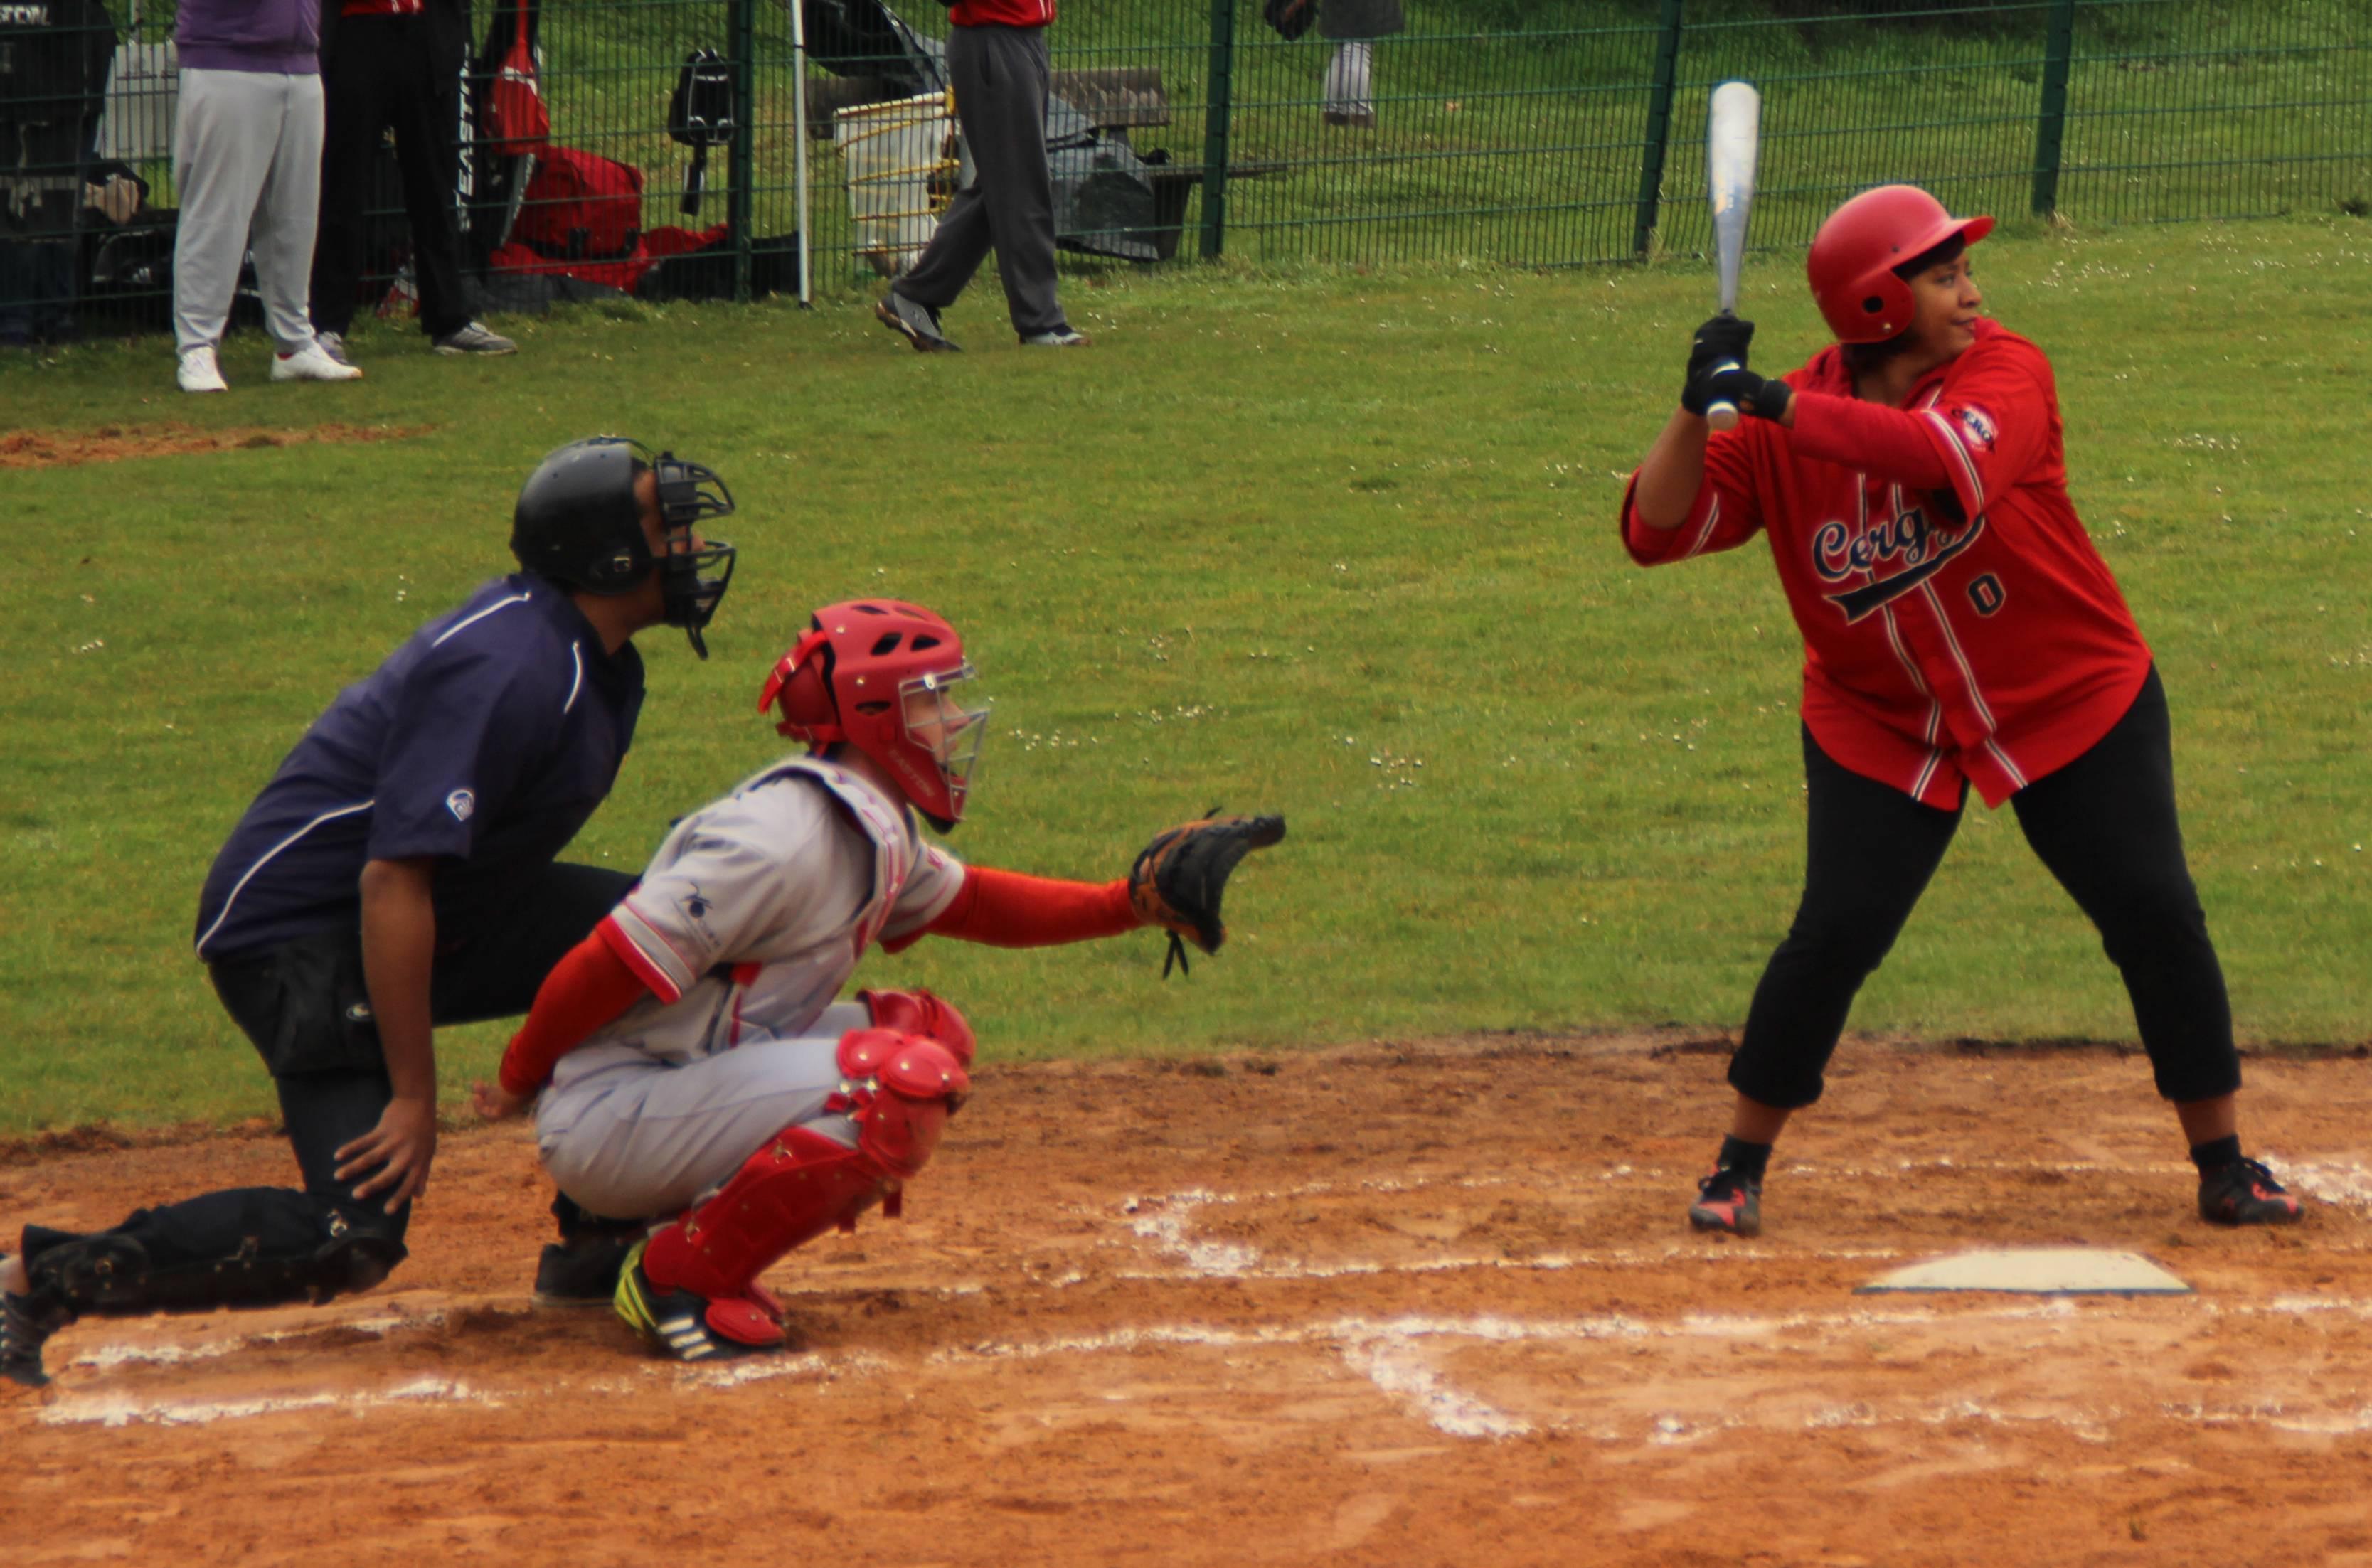 2015-03-28 Baseball R3 (7)